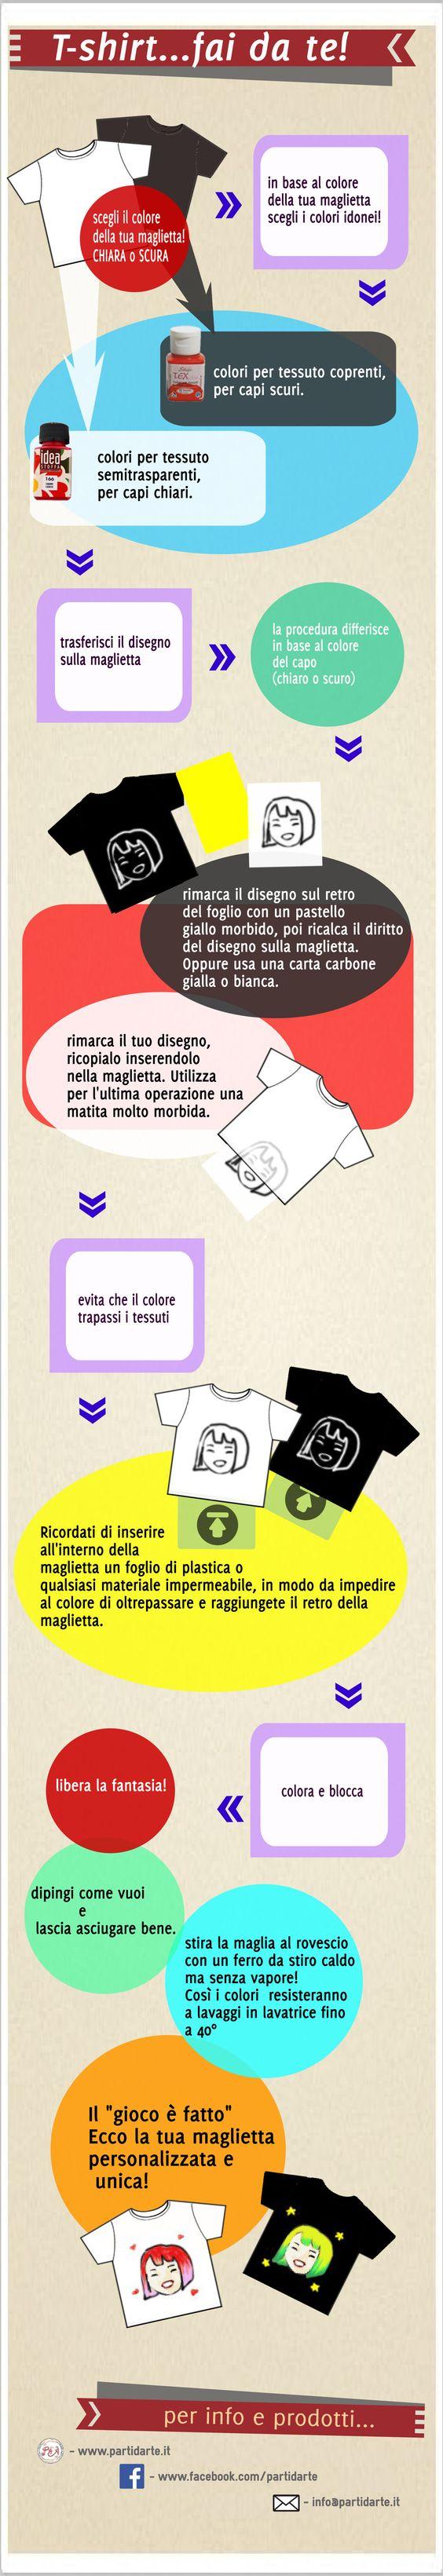 passaggi fondamentali per dipingere una t-shirt: